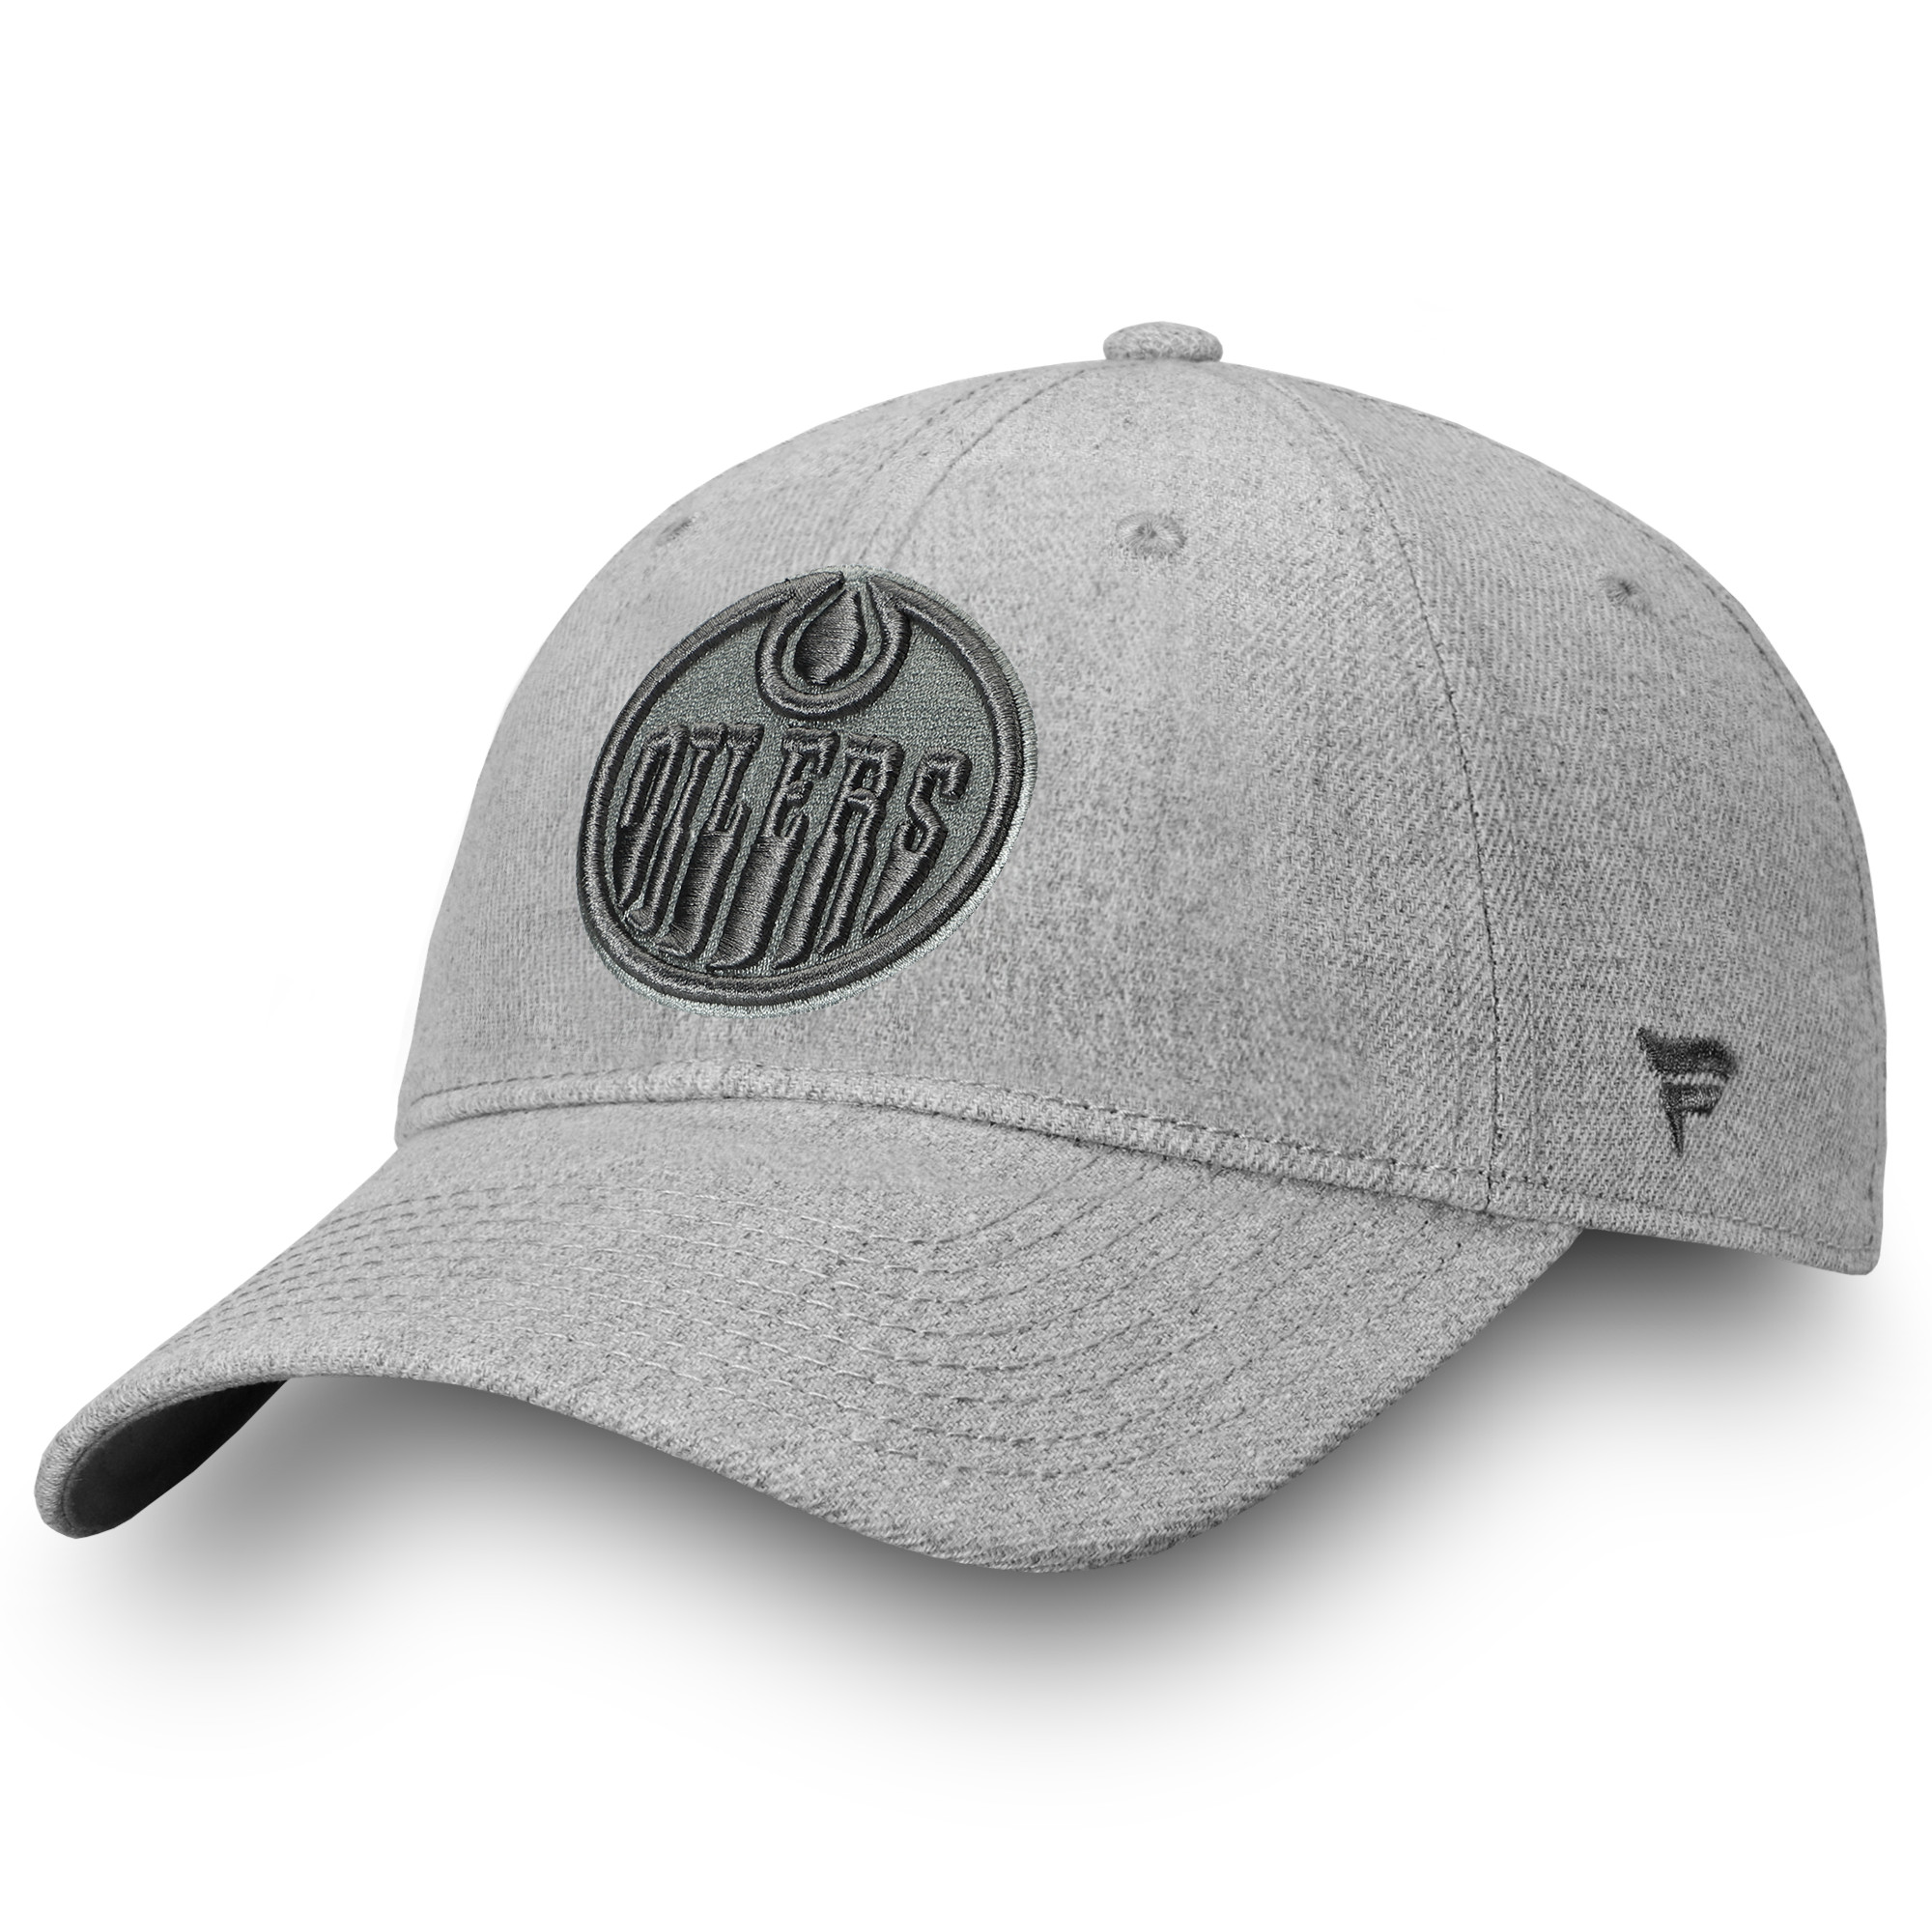 ... purchase edmonton oilers fanatics branded team haze adjustable snapback  hat gray osfa 66ef4 6082a 6f7887a9e5d1